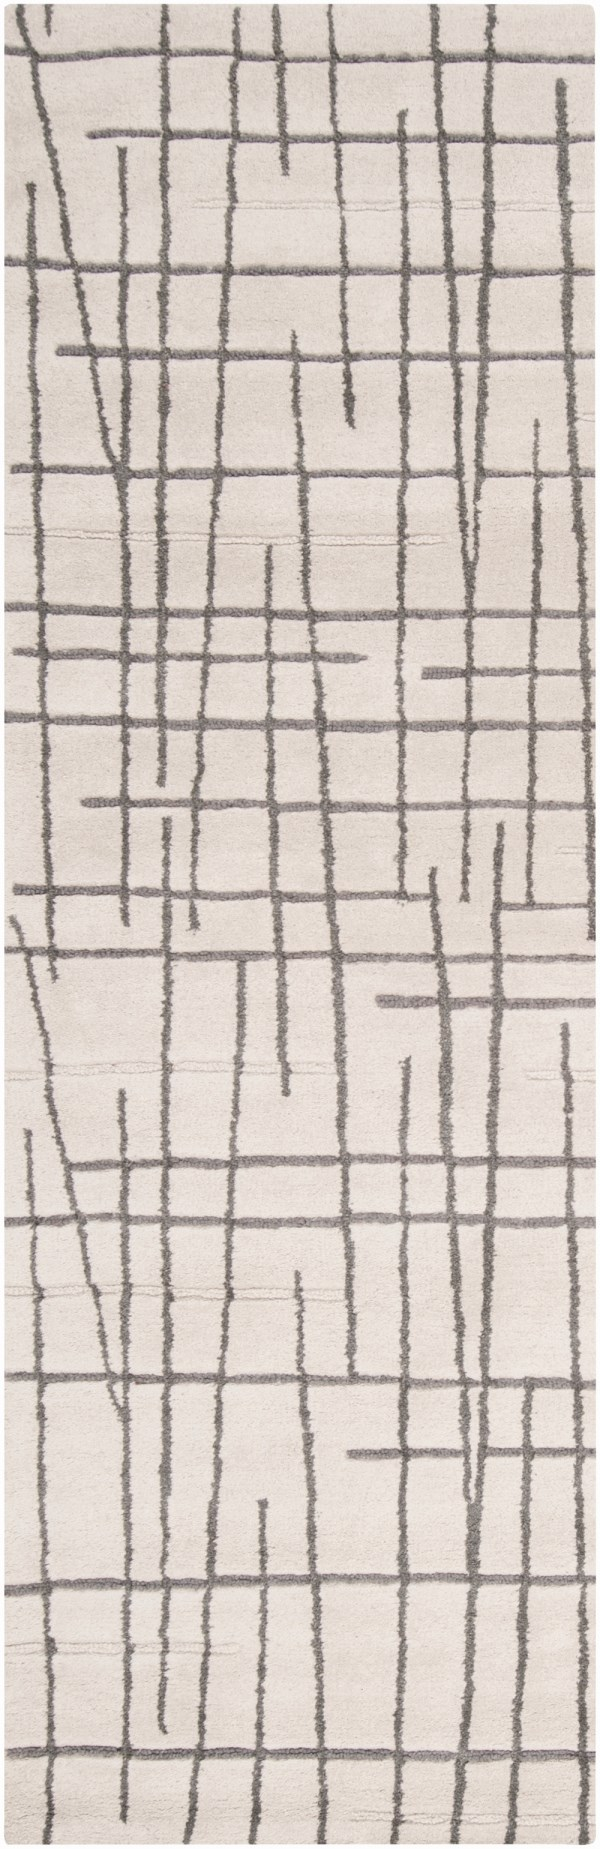 Beige, Medium Grey Transitional Area Rug